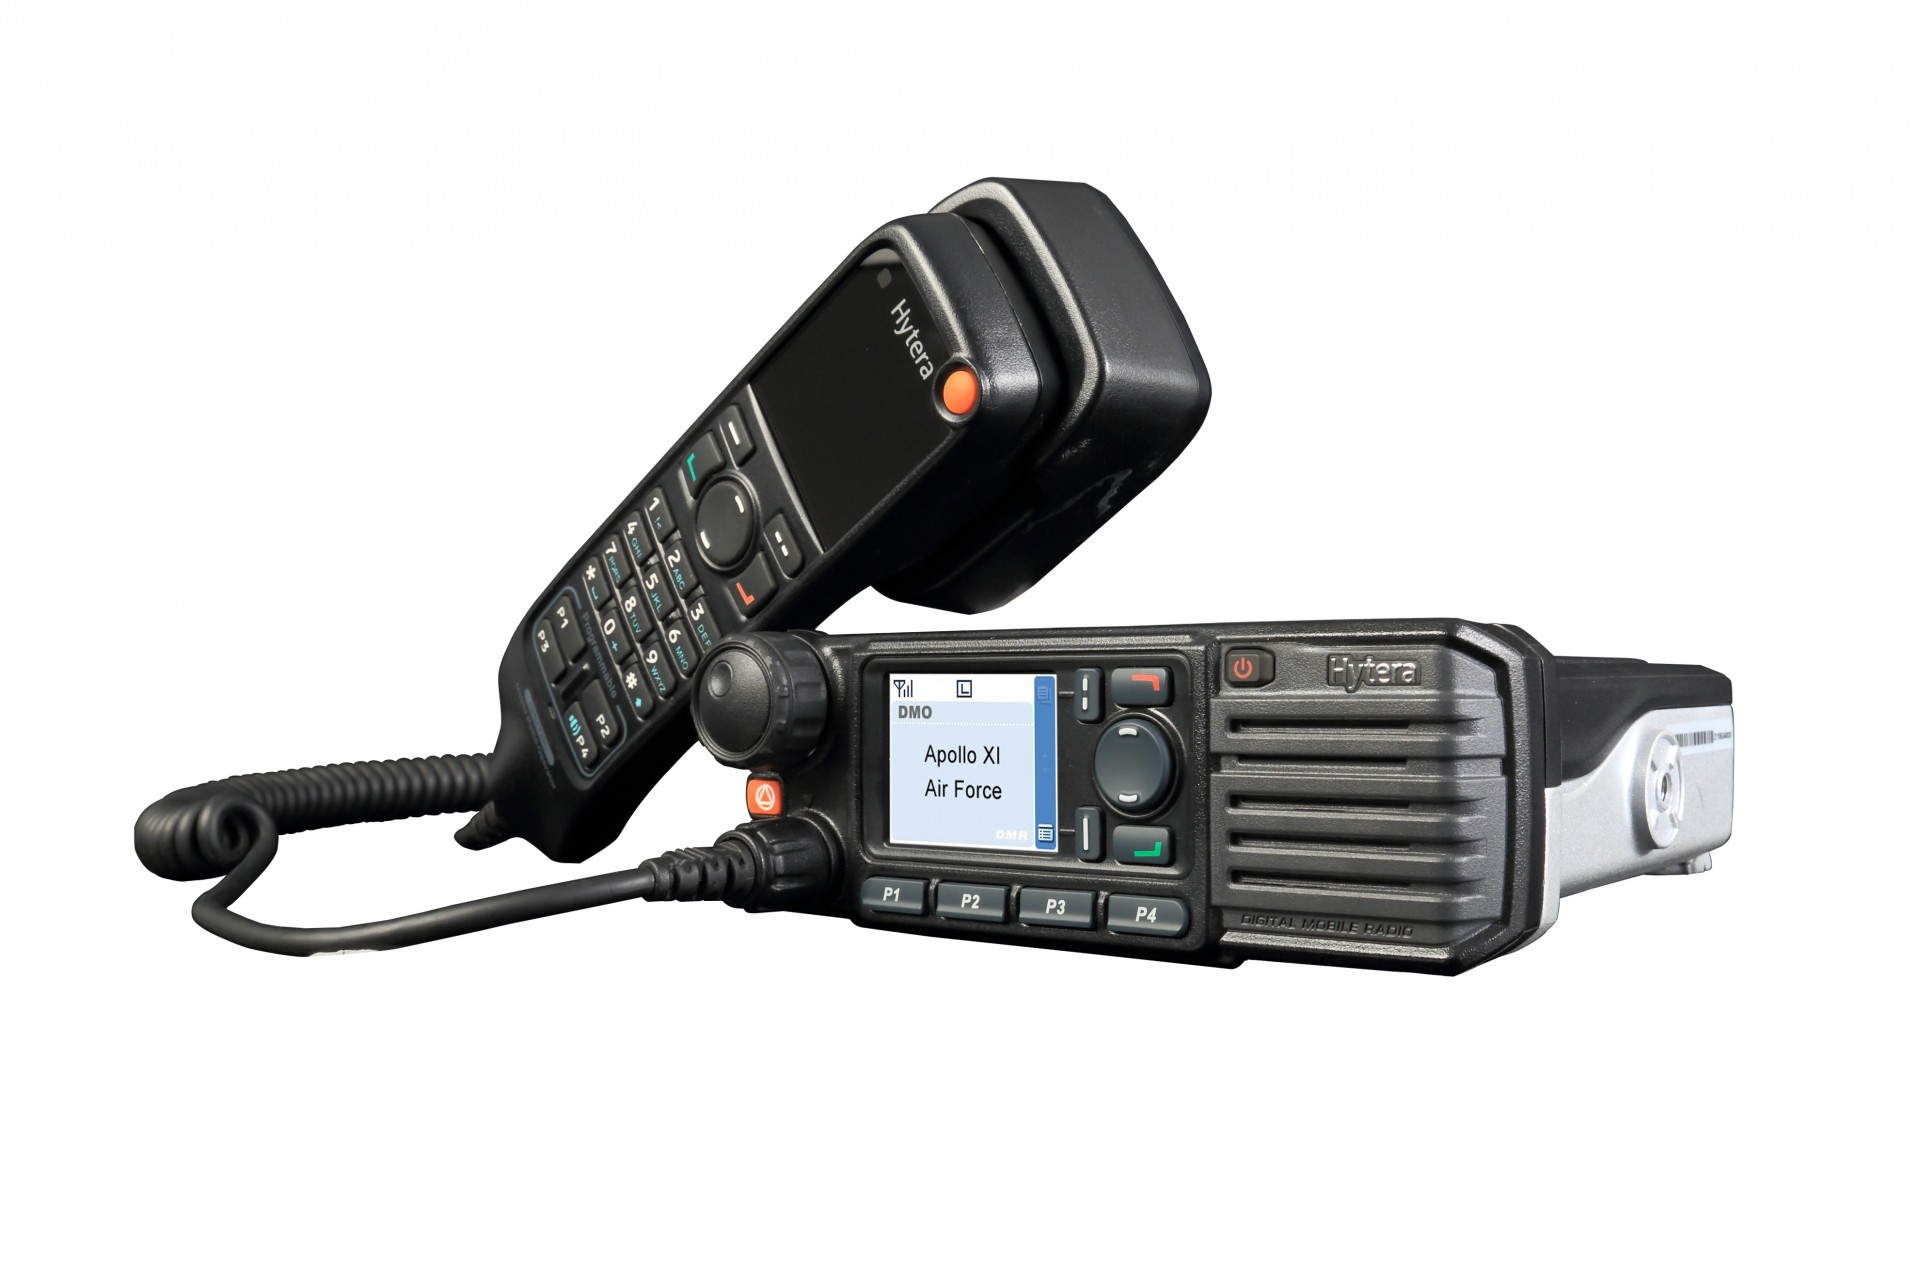 MD78XG Trunking Duplex Moble Radio_1